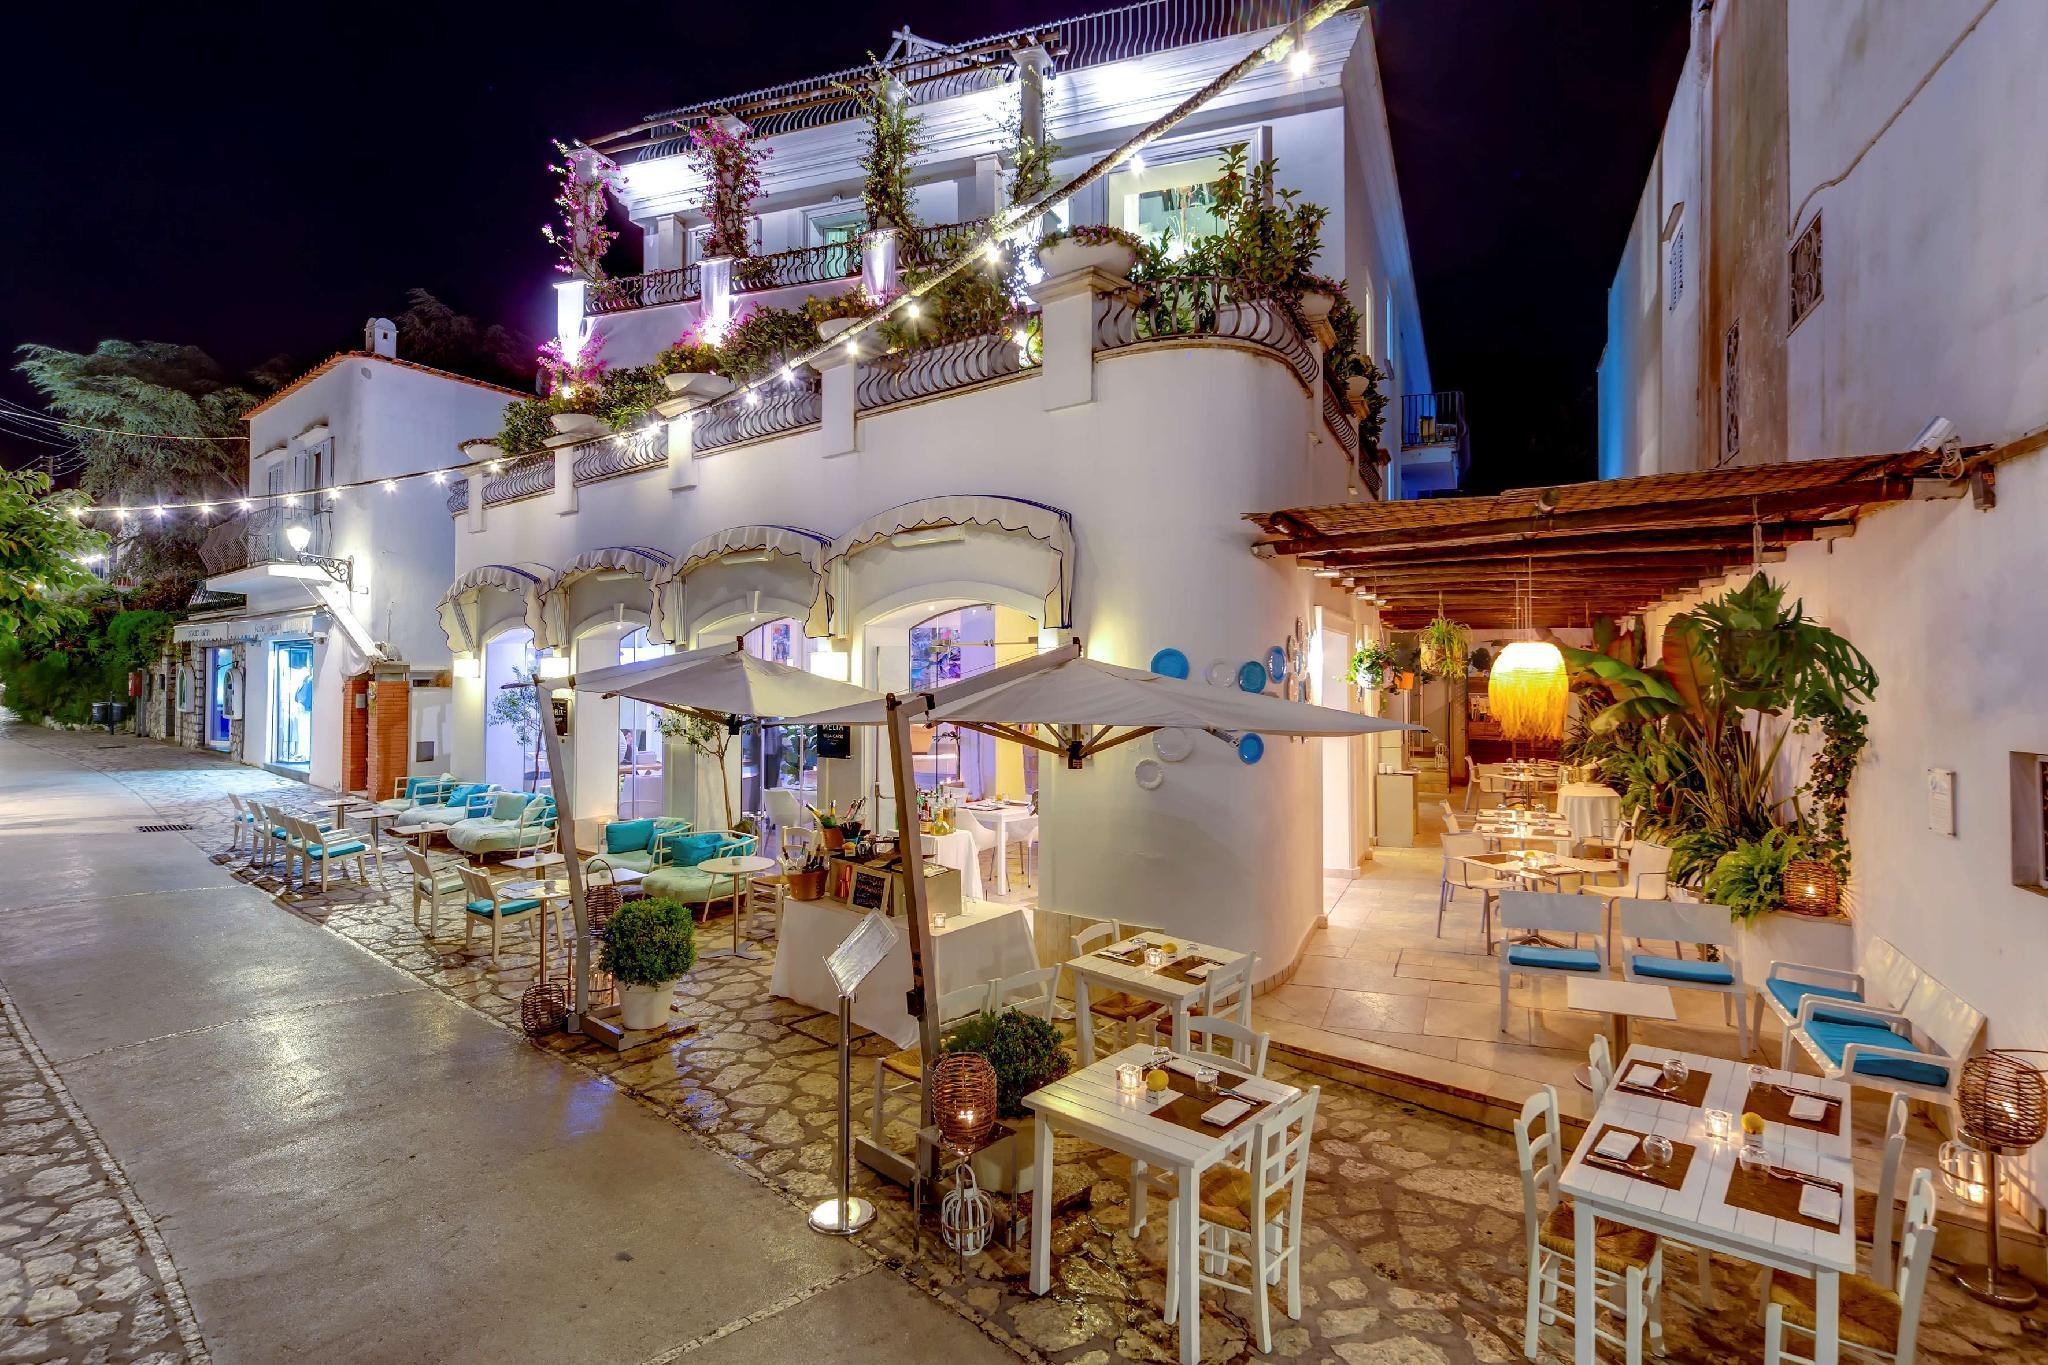 Tenuta Contessa Relais Country House italy hotel list - 13 - navitime transit